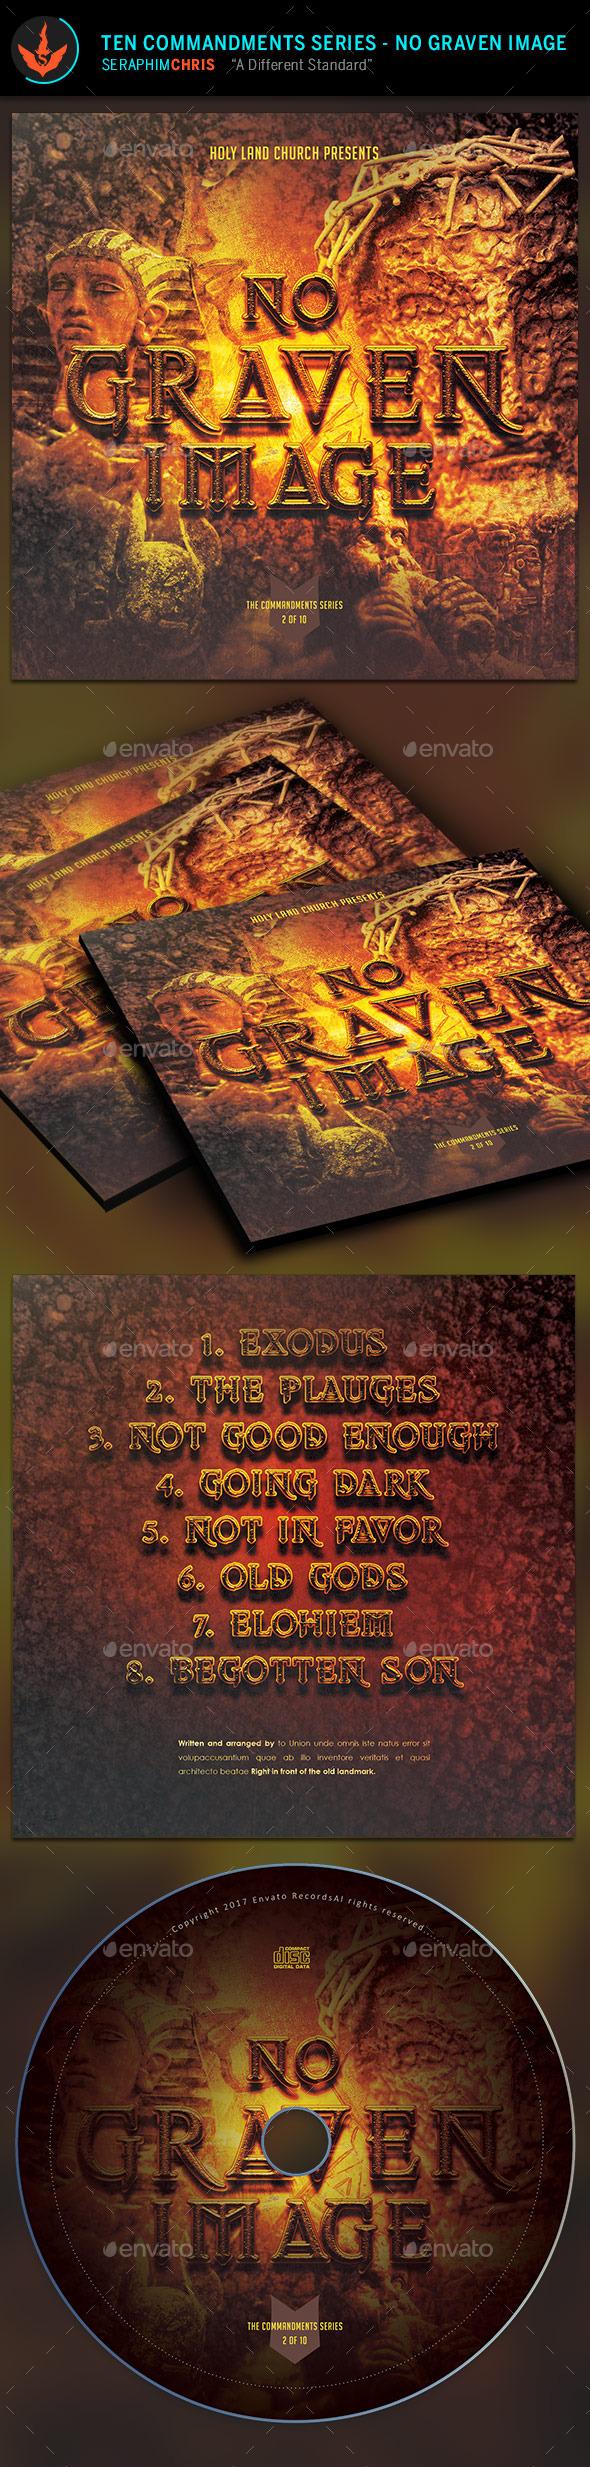 No Graven Image: CD Artwork Template - CD & DVD Artwork Print Templates